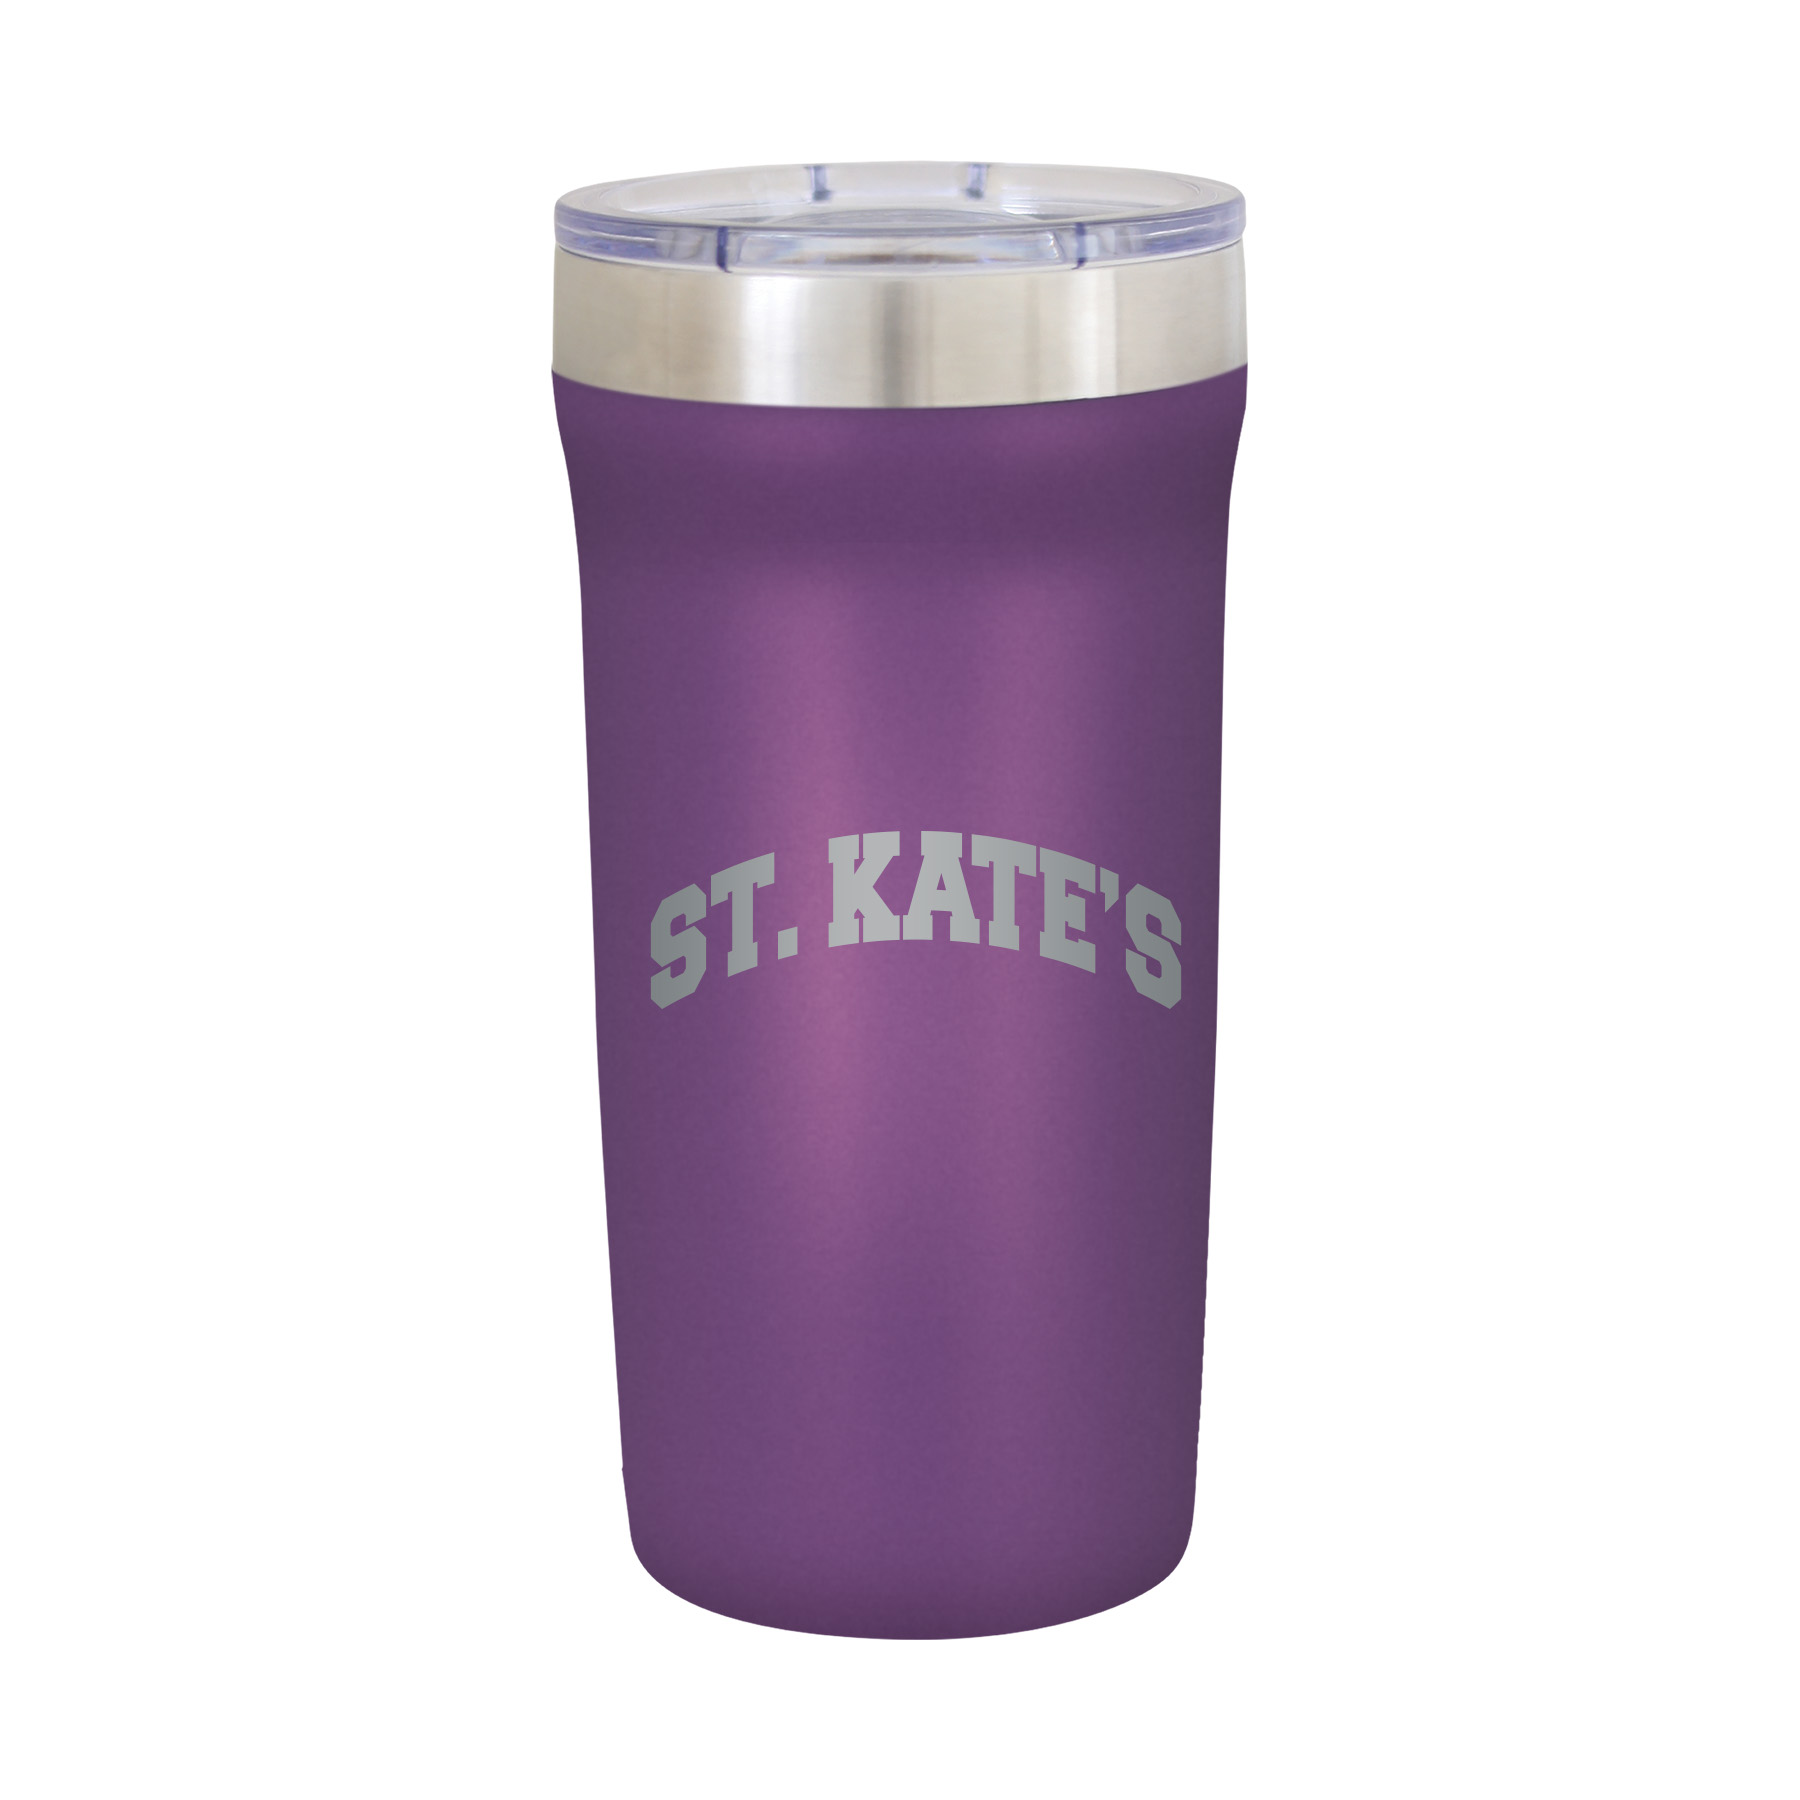 St. Kate's Stainless Tumbler